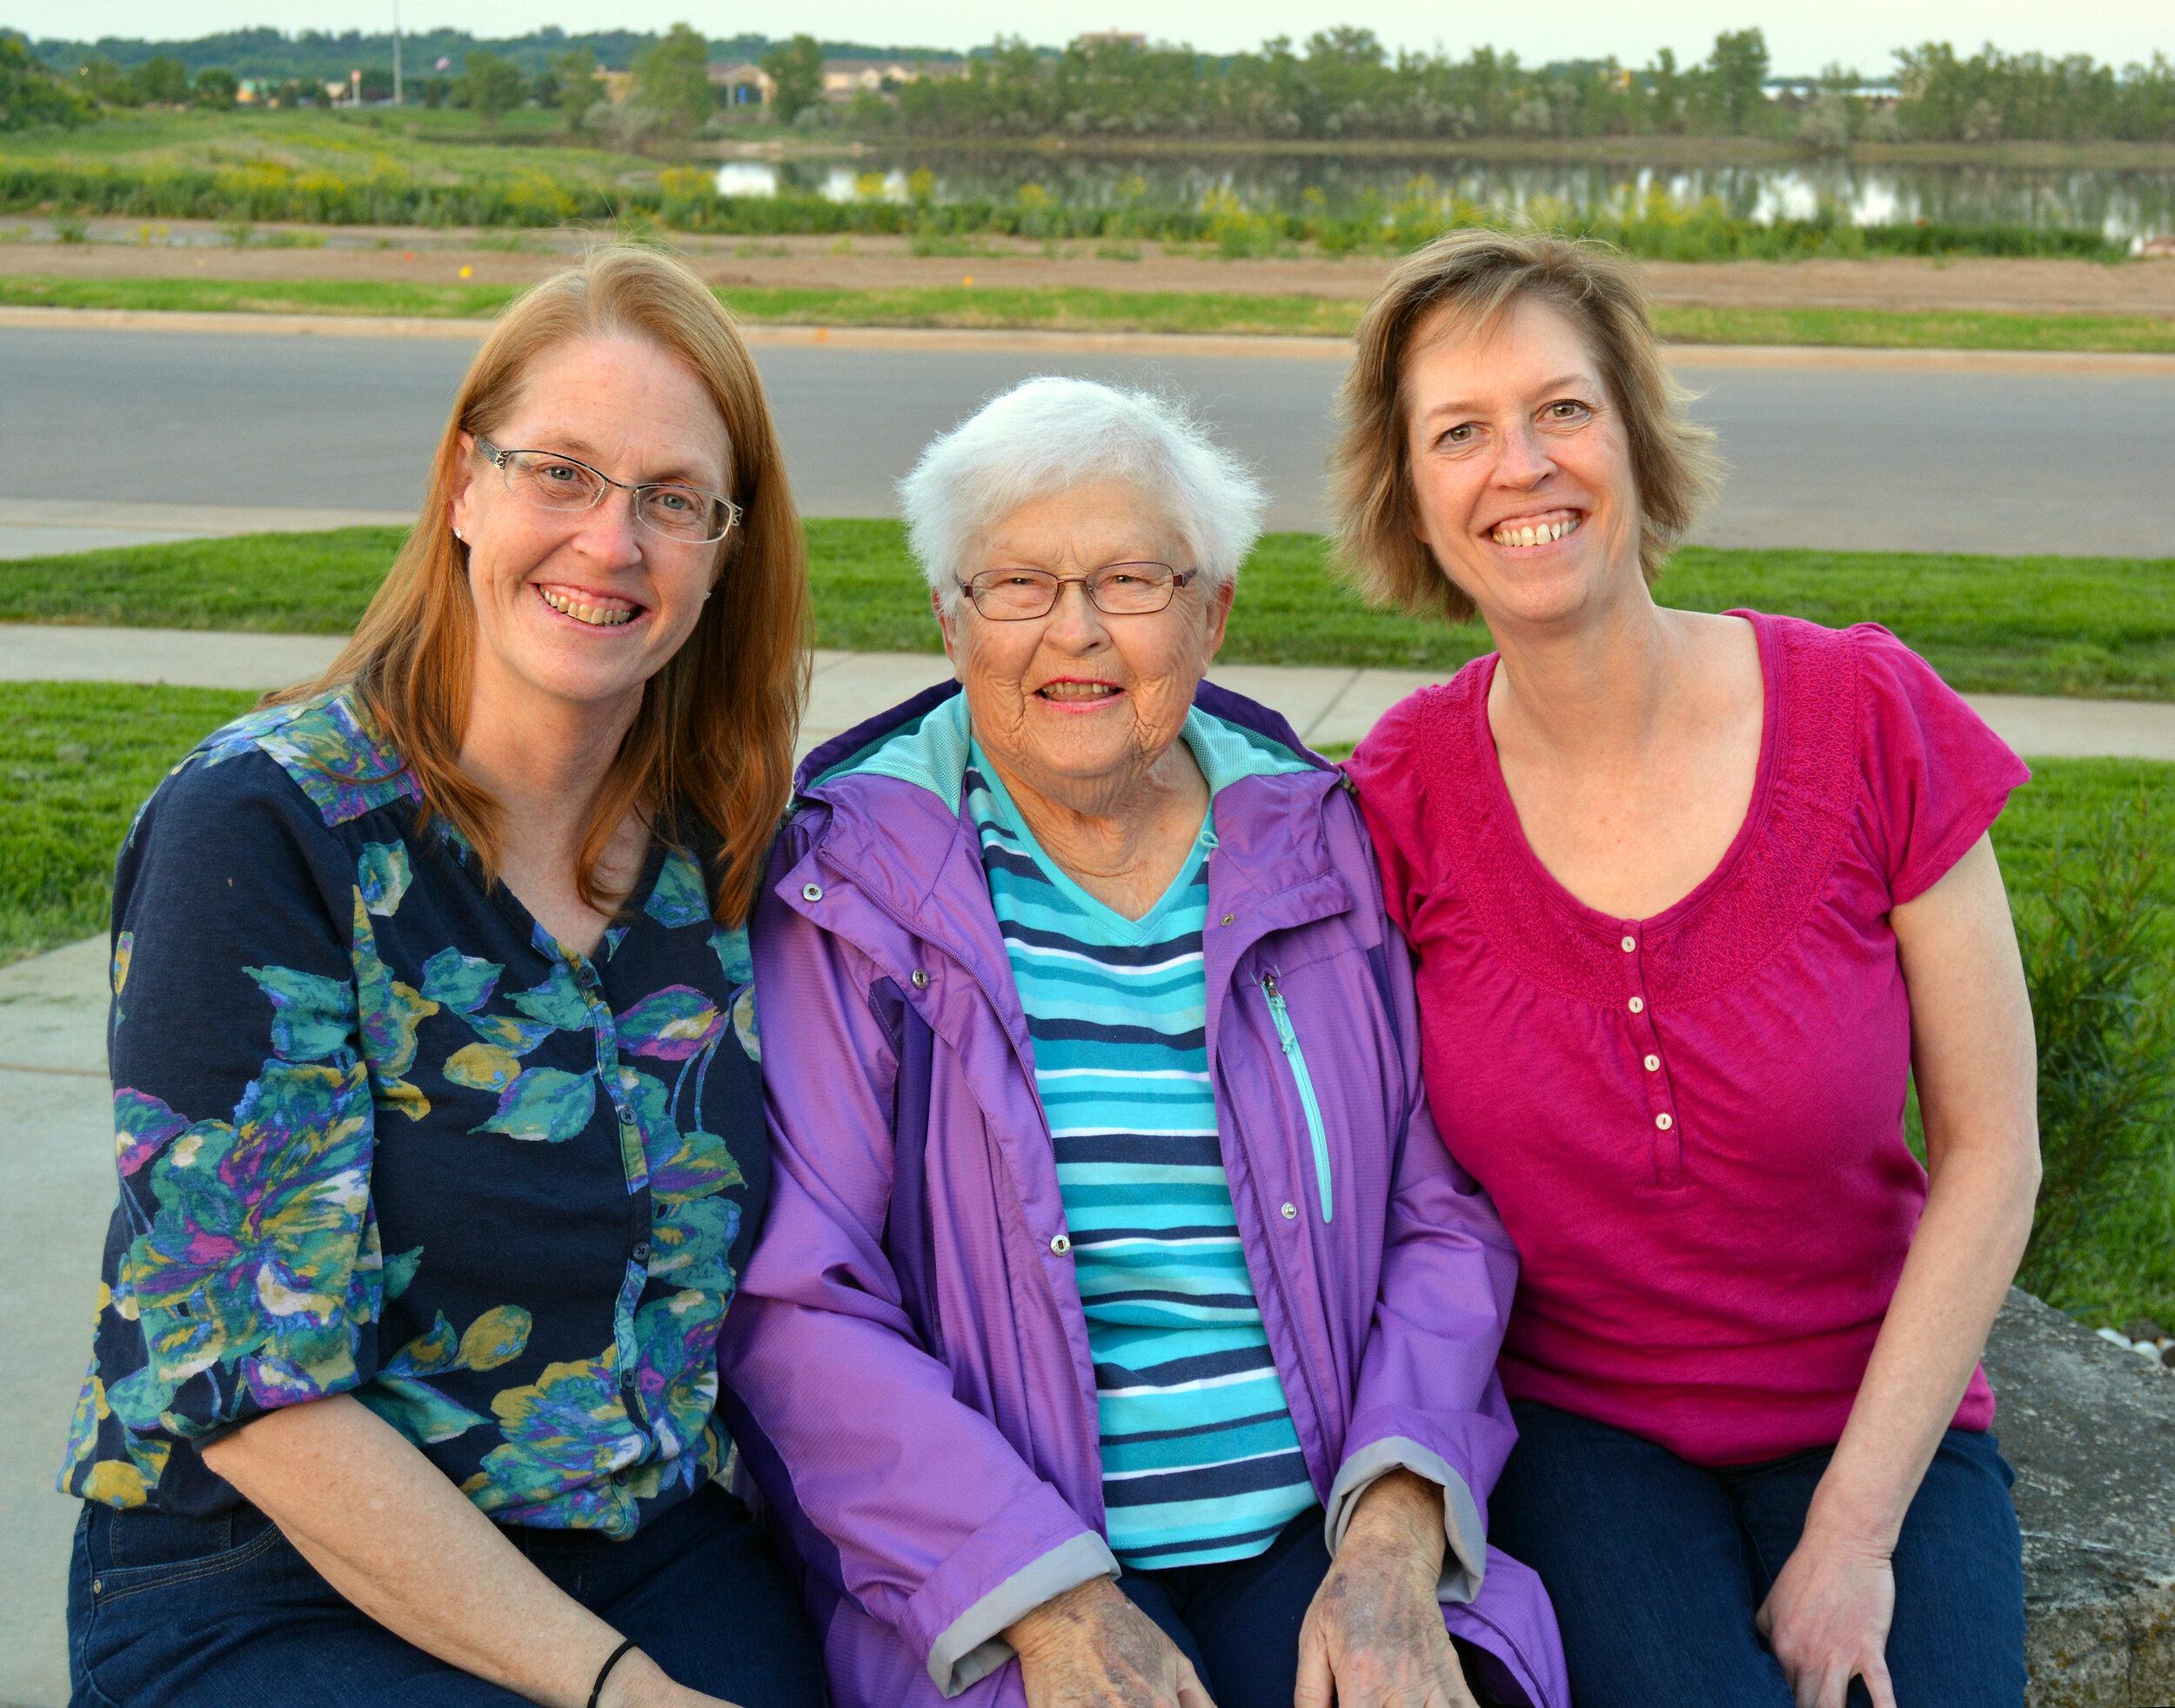 Lake Lorraine namesake Hilda Lorraine Friessen with her two daughters, Patty Vognild and Cindy Monnin.